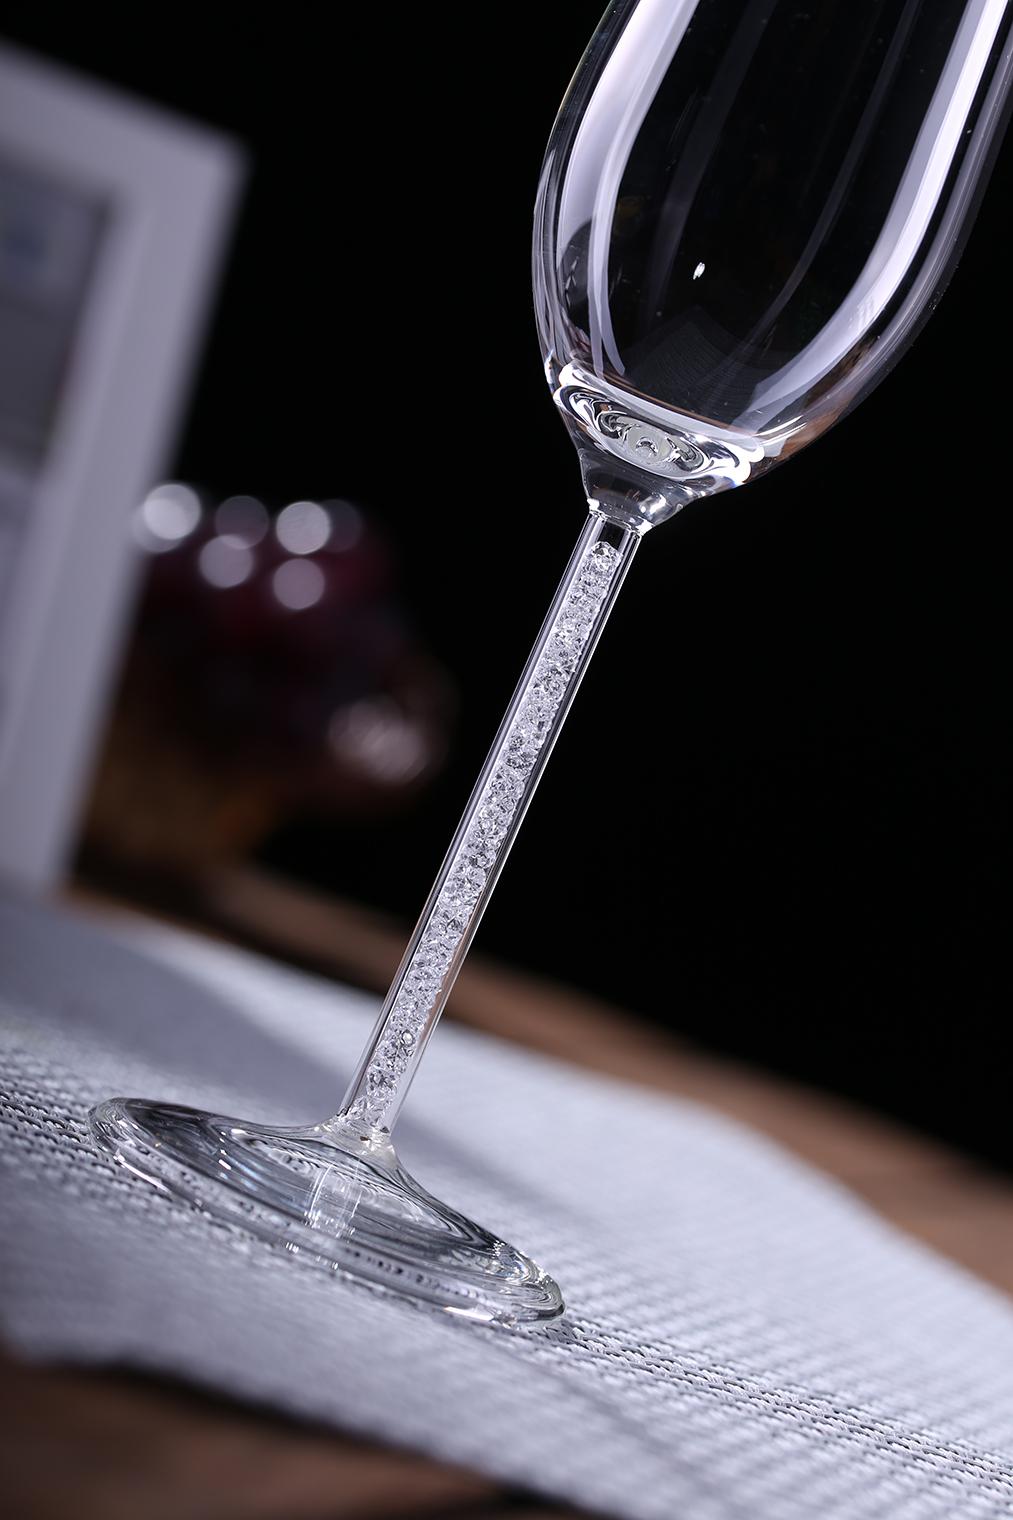 670ml Handmade  High Quality Borosilicate Glass Goblet Wine Glass